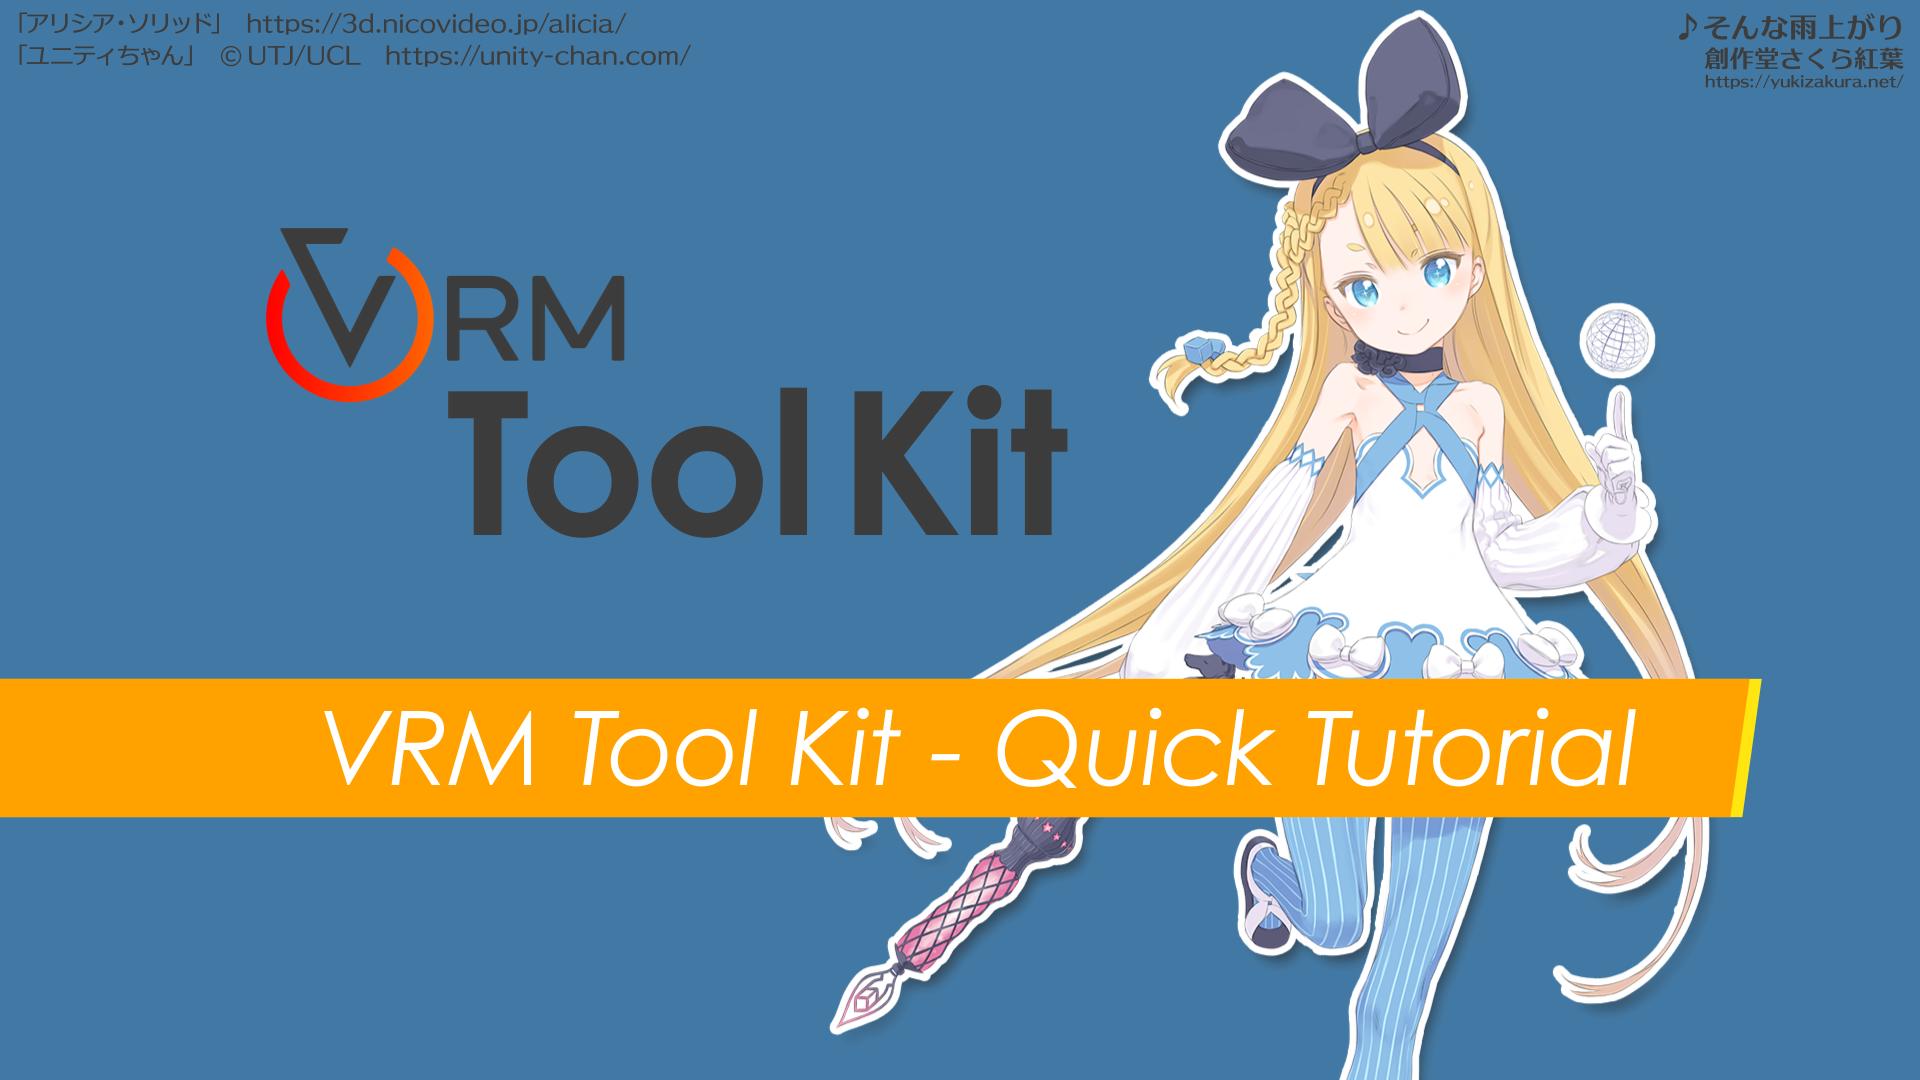 VRM Tool Kit